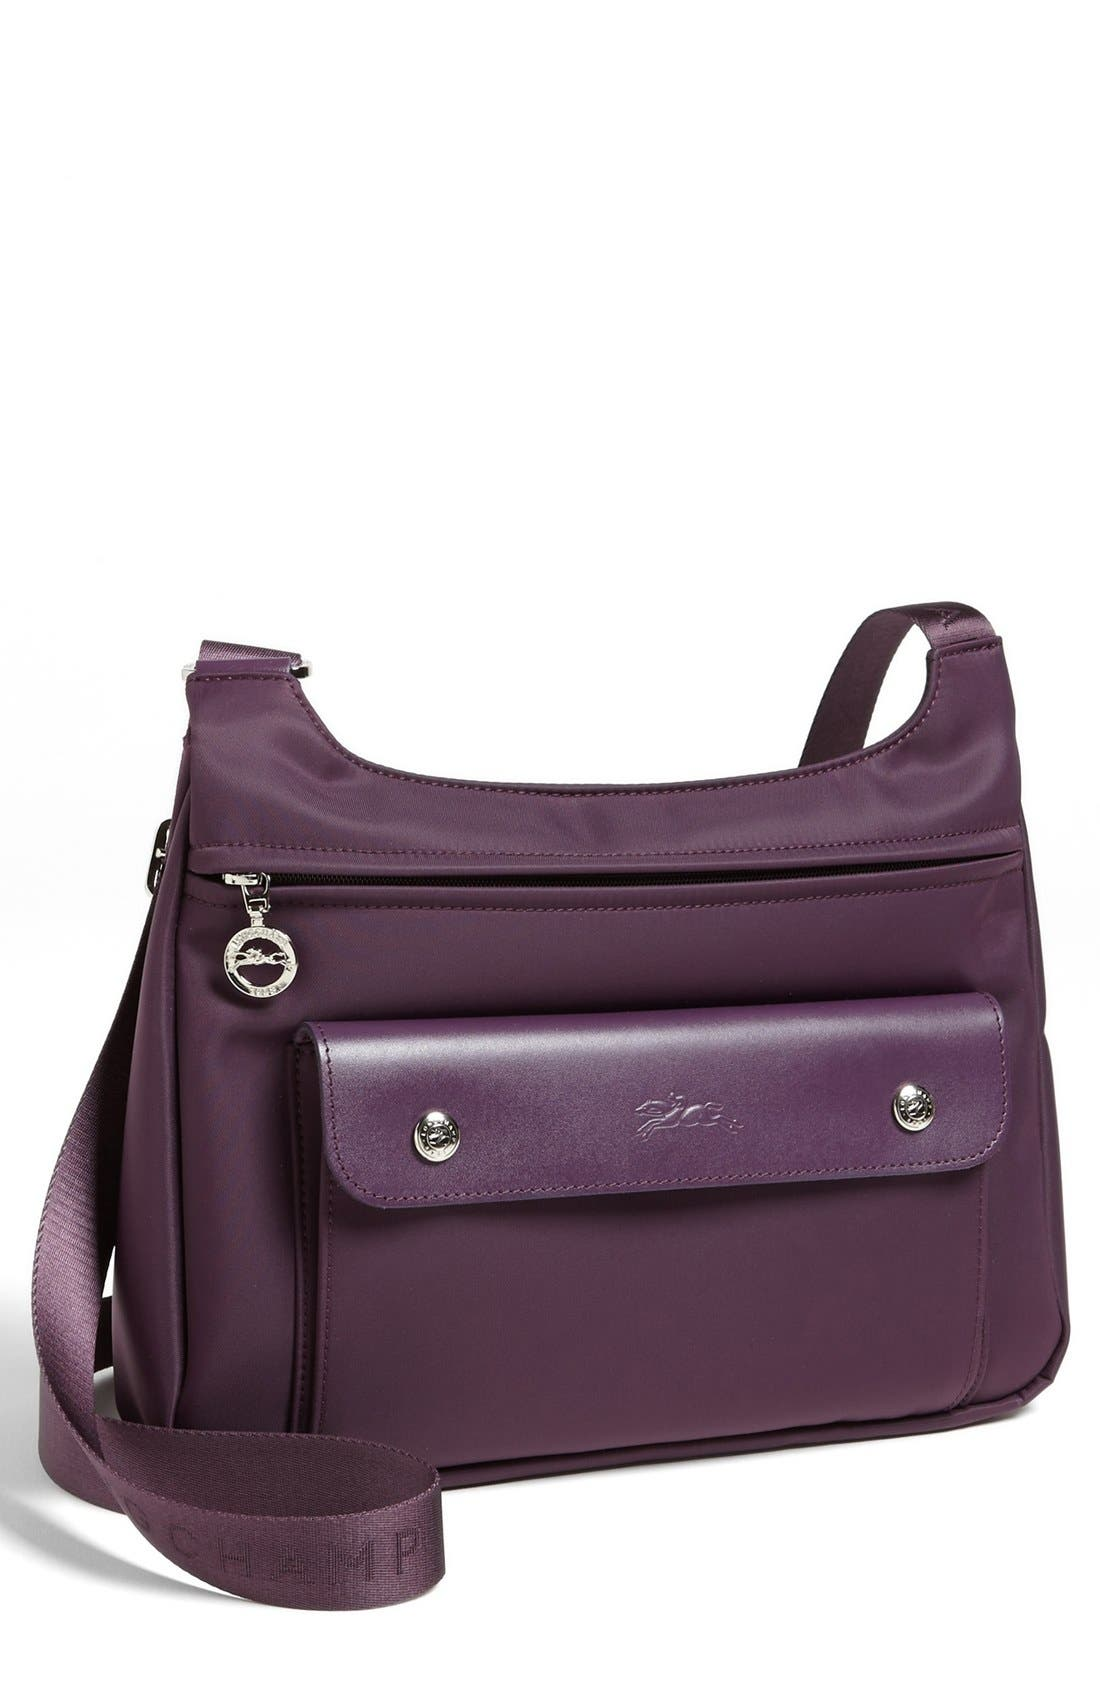 Main Image - Longchamp 'Planetes' Crossbody Bag